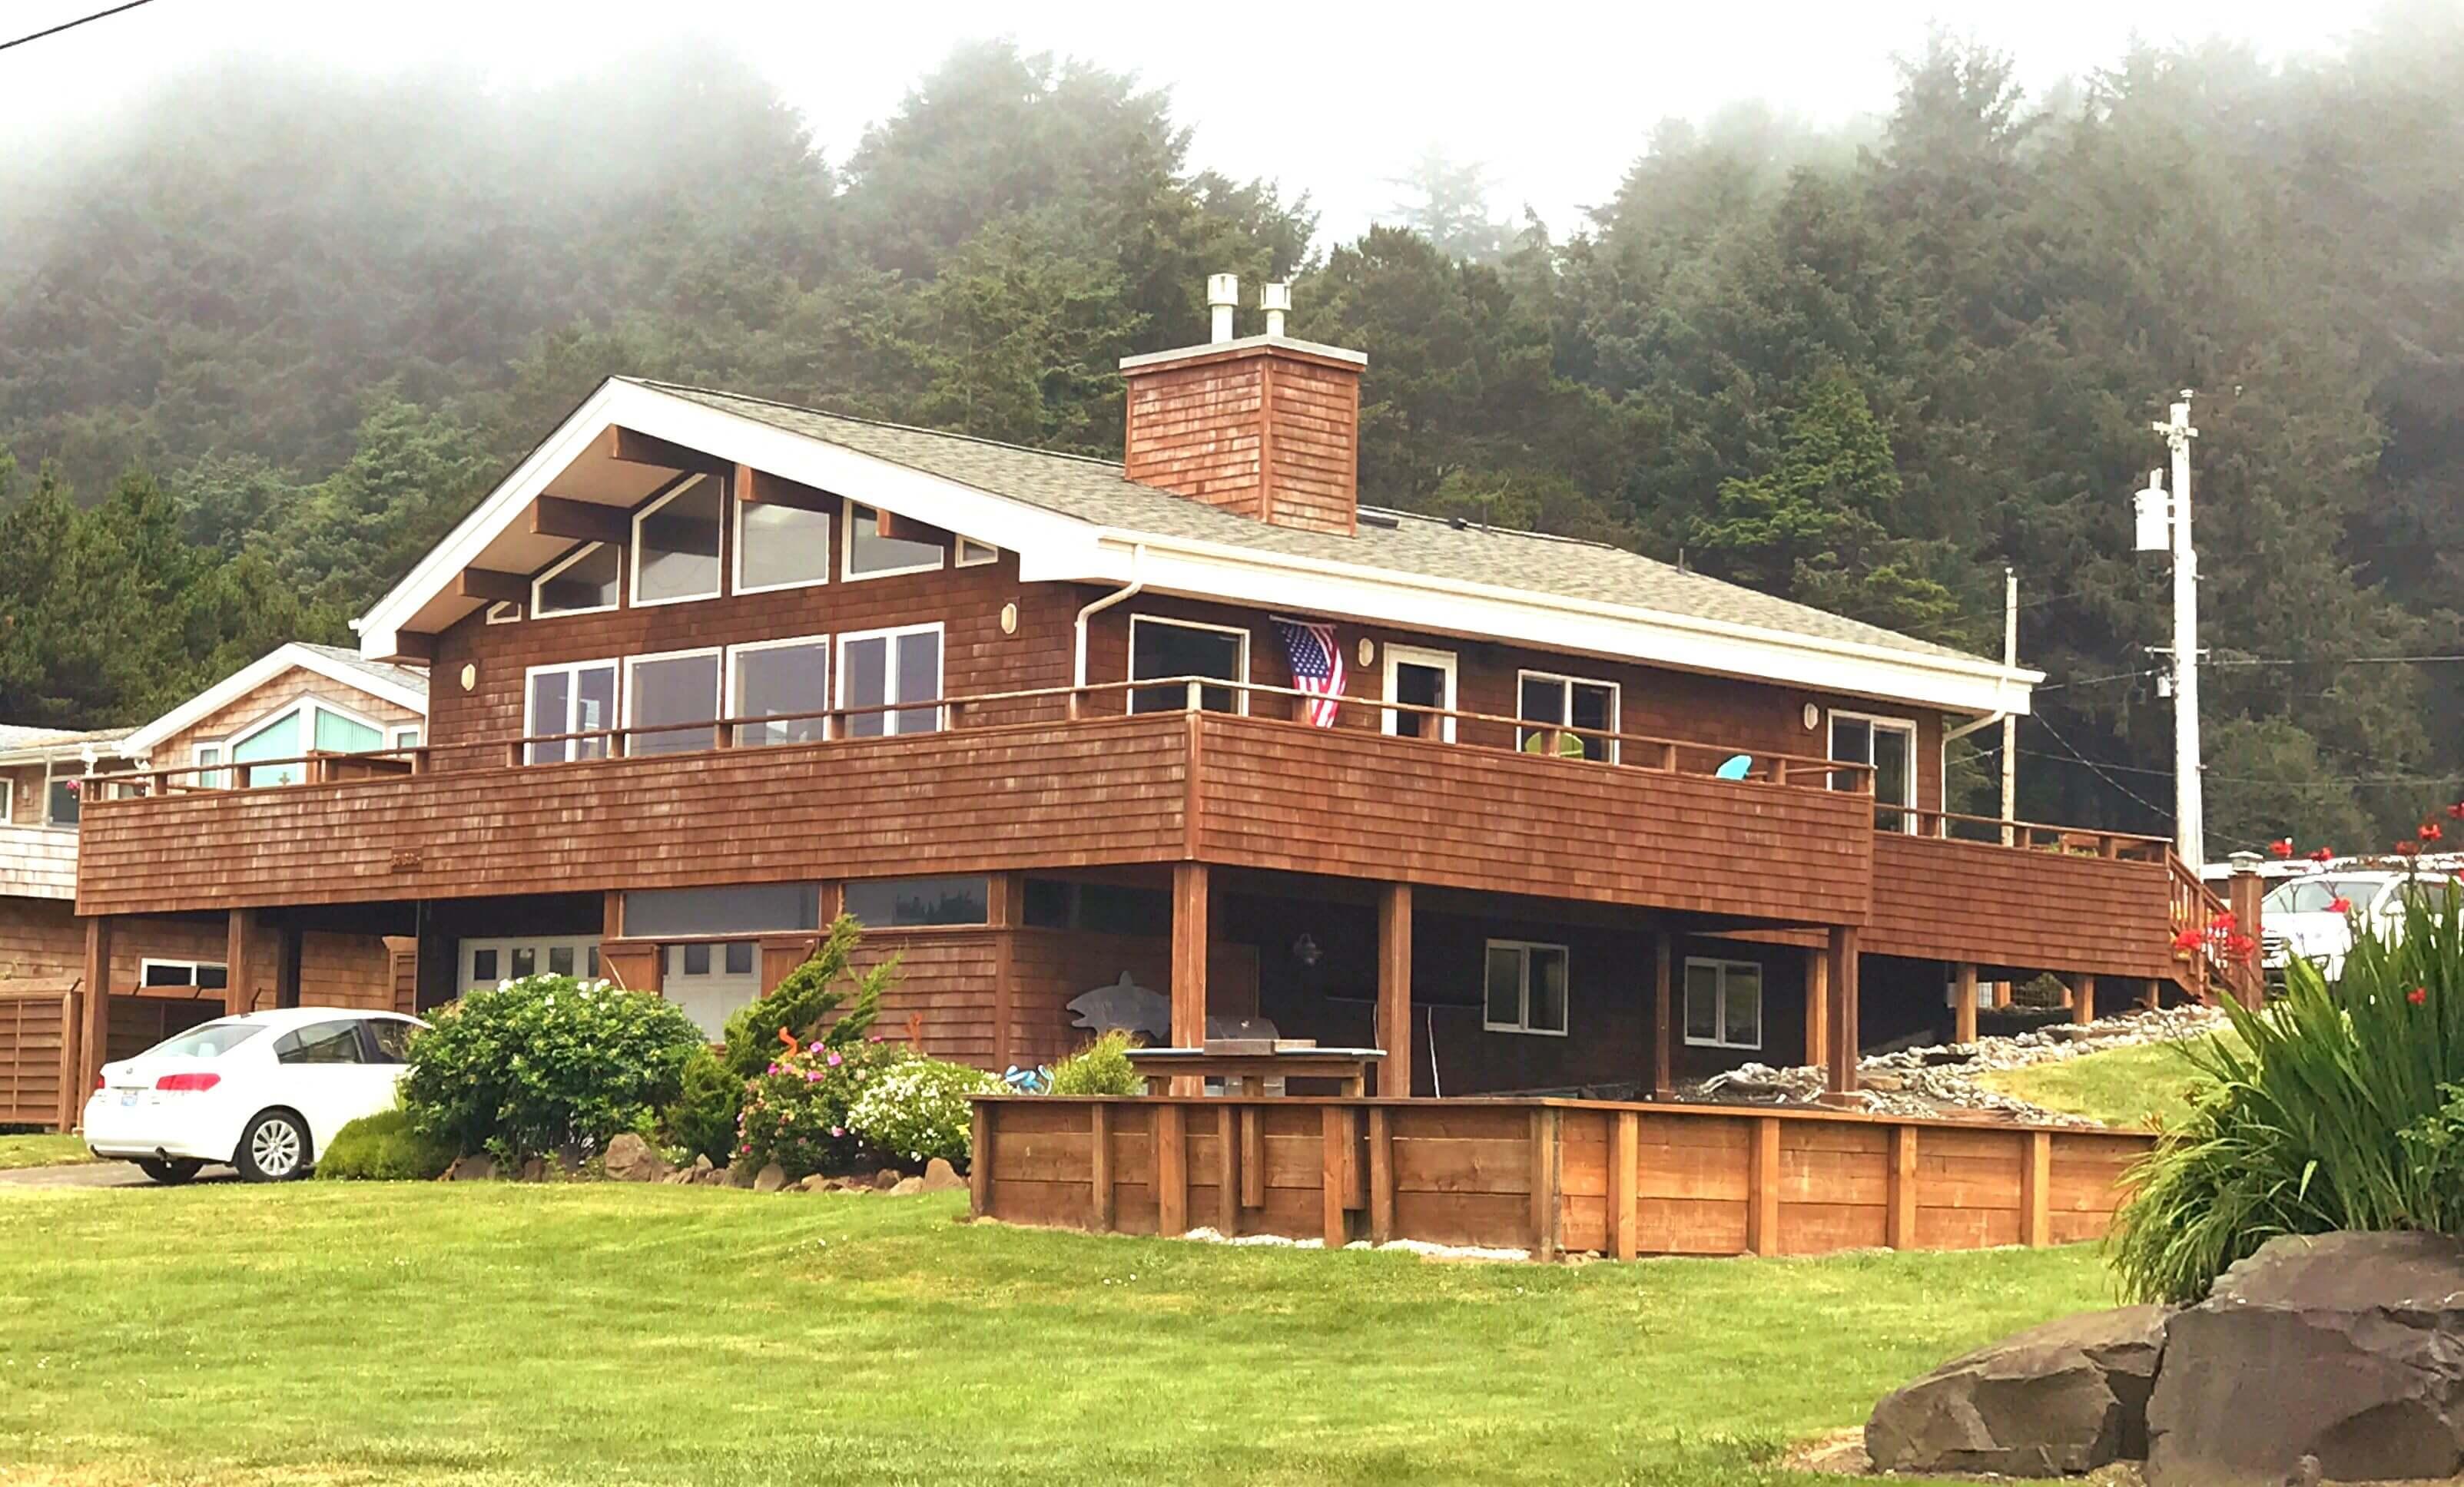 Vacation Property Insurance 2 Iboaz